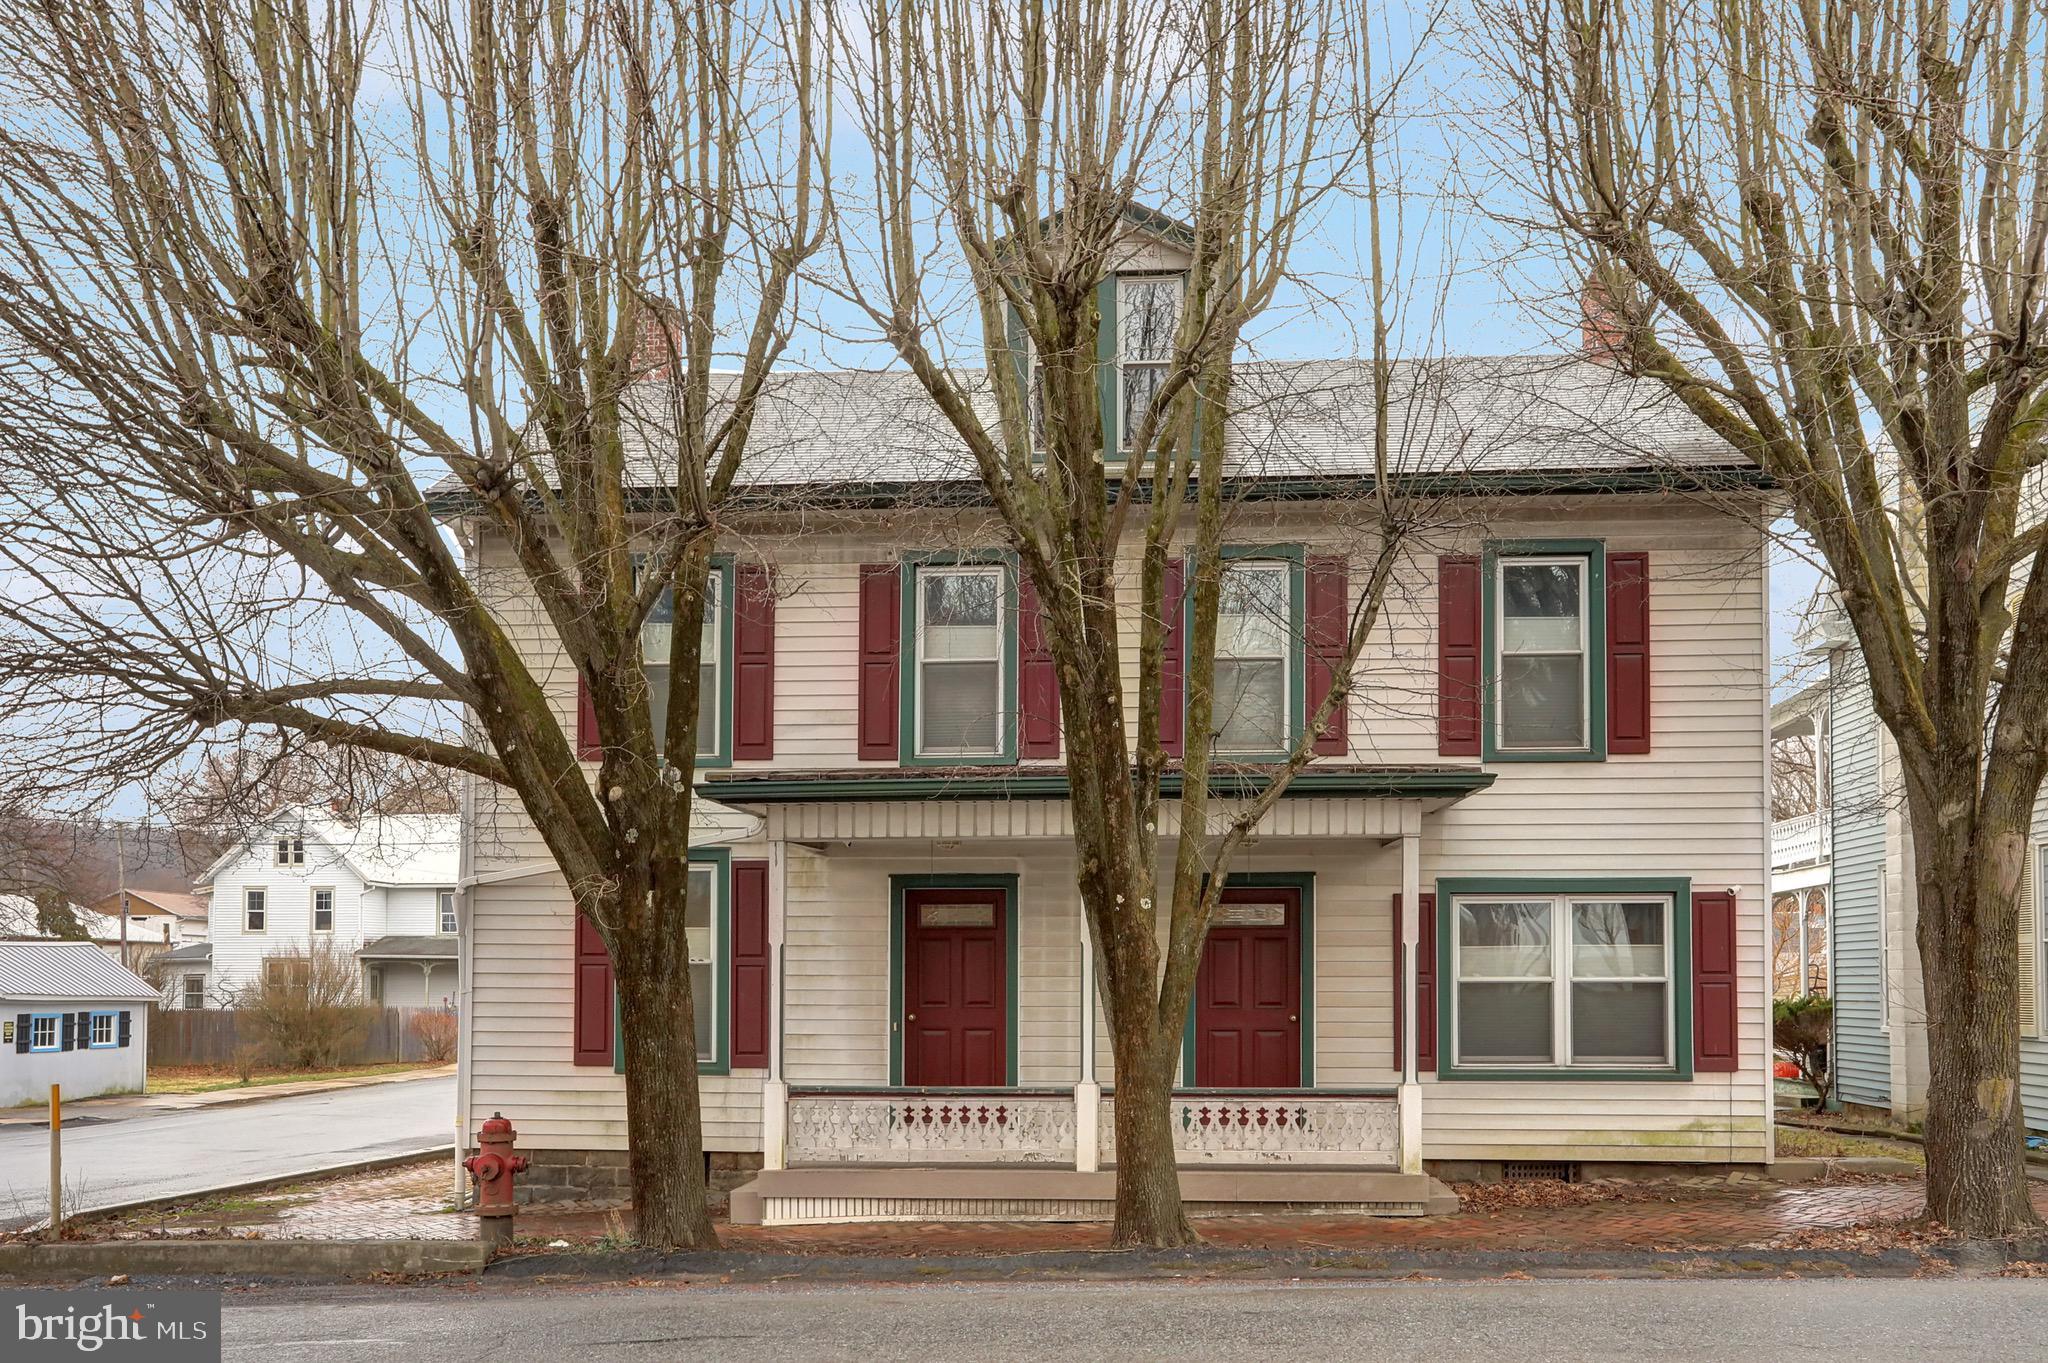 122 S CARLISLE STREET, NEW BLOOMFIELD, PA 17068